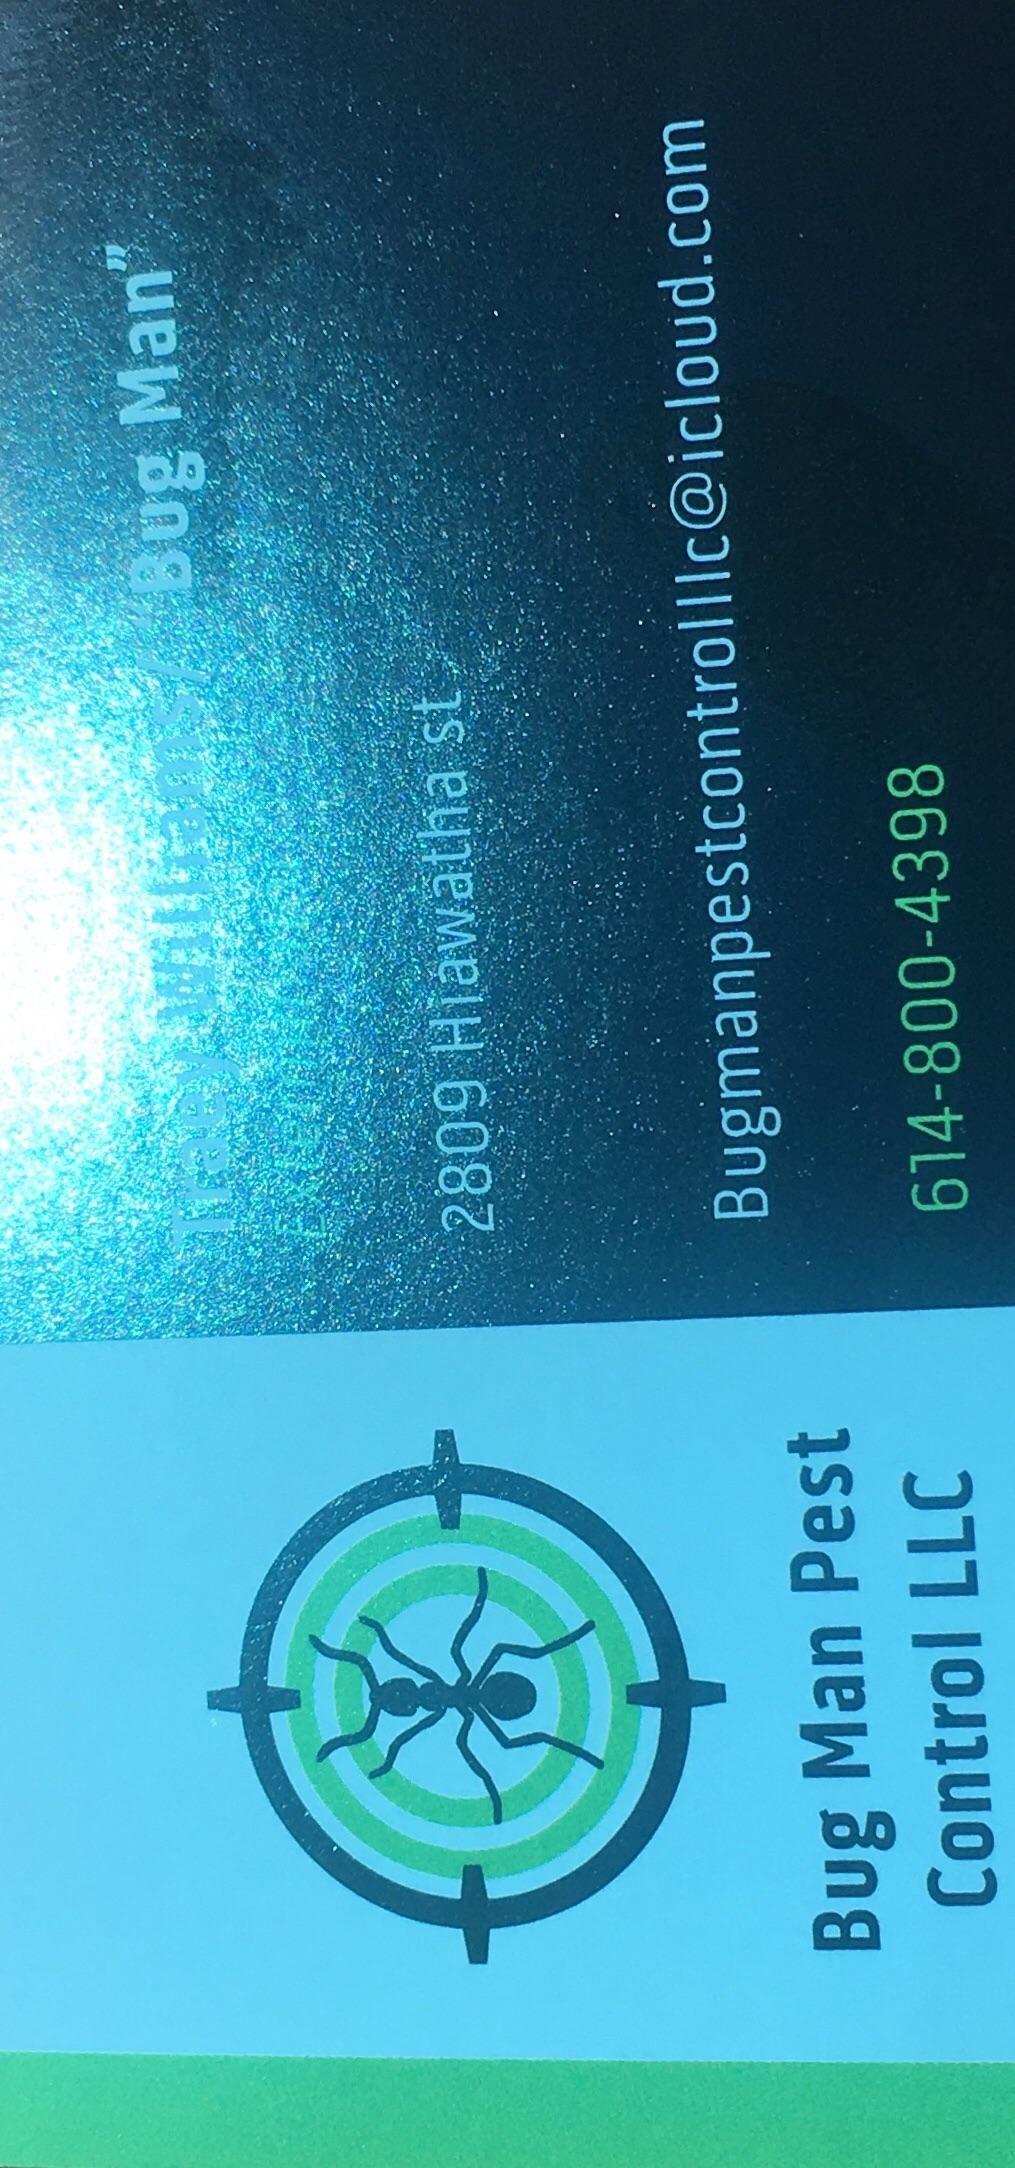 Bug Man Pest Control Service LLC